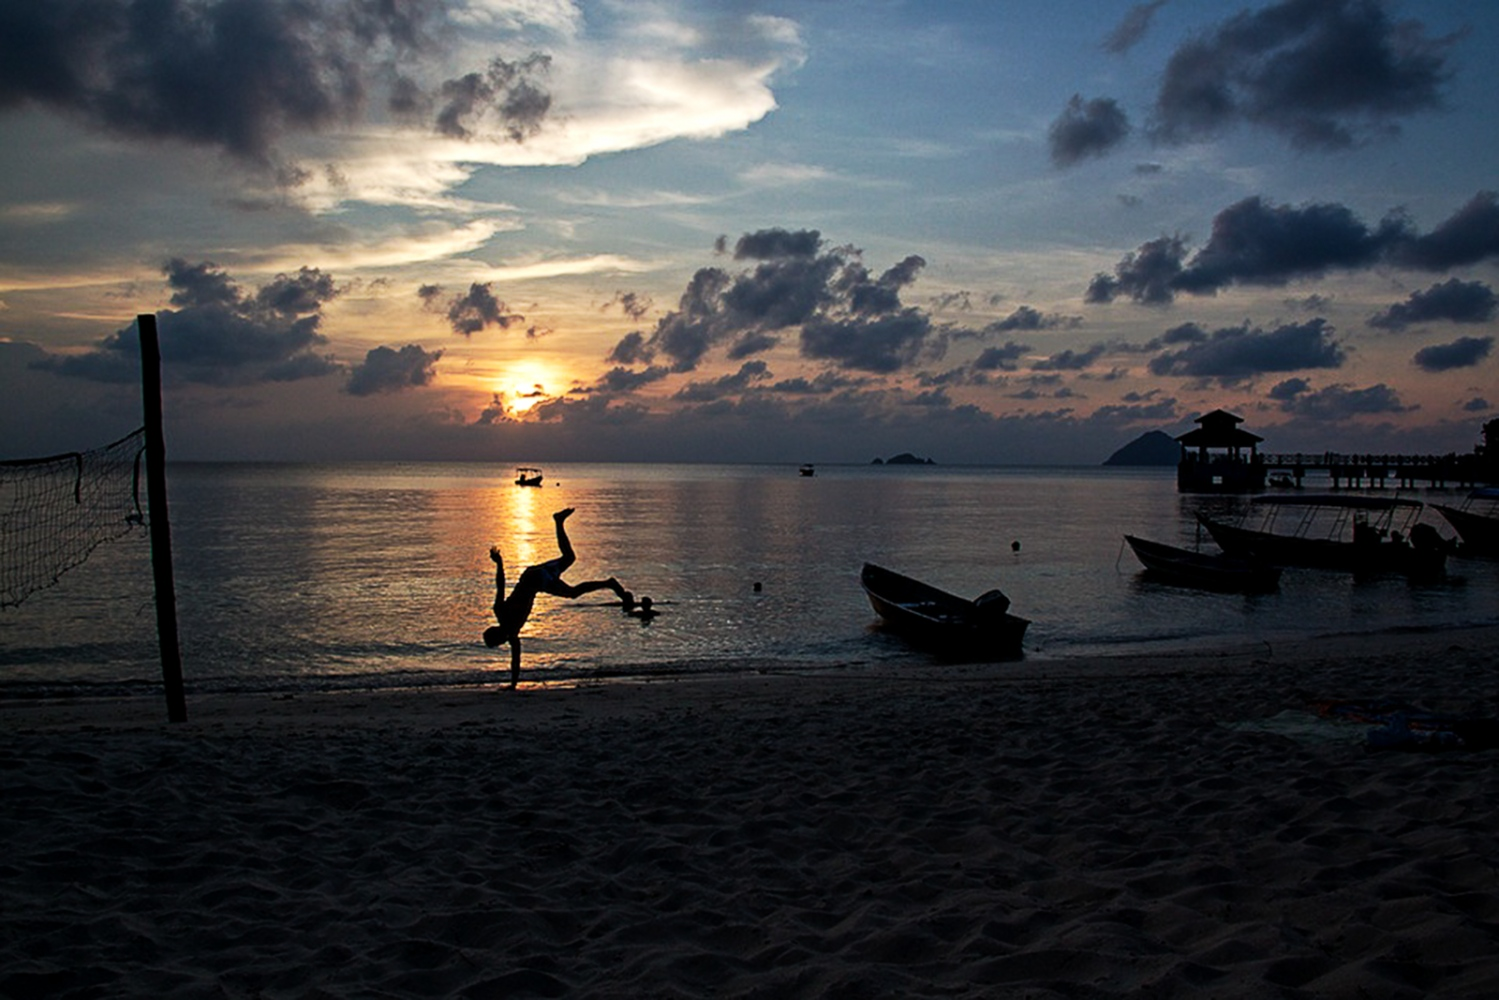 Perhentian Kecil, MALAYSIA, April 26, 2011: A man practices Capoeira at Coral beach.